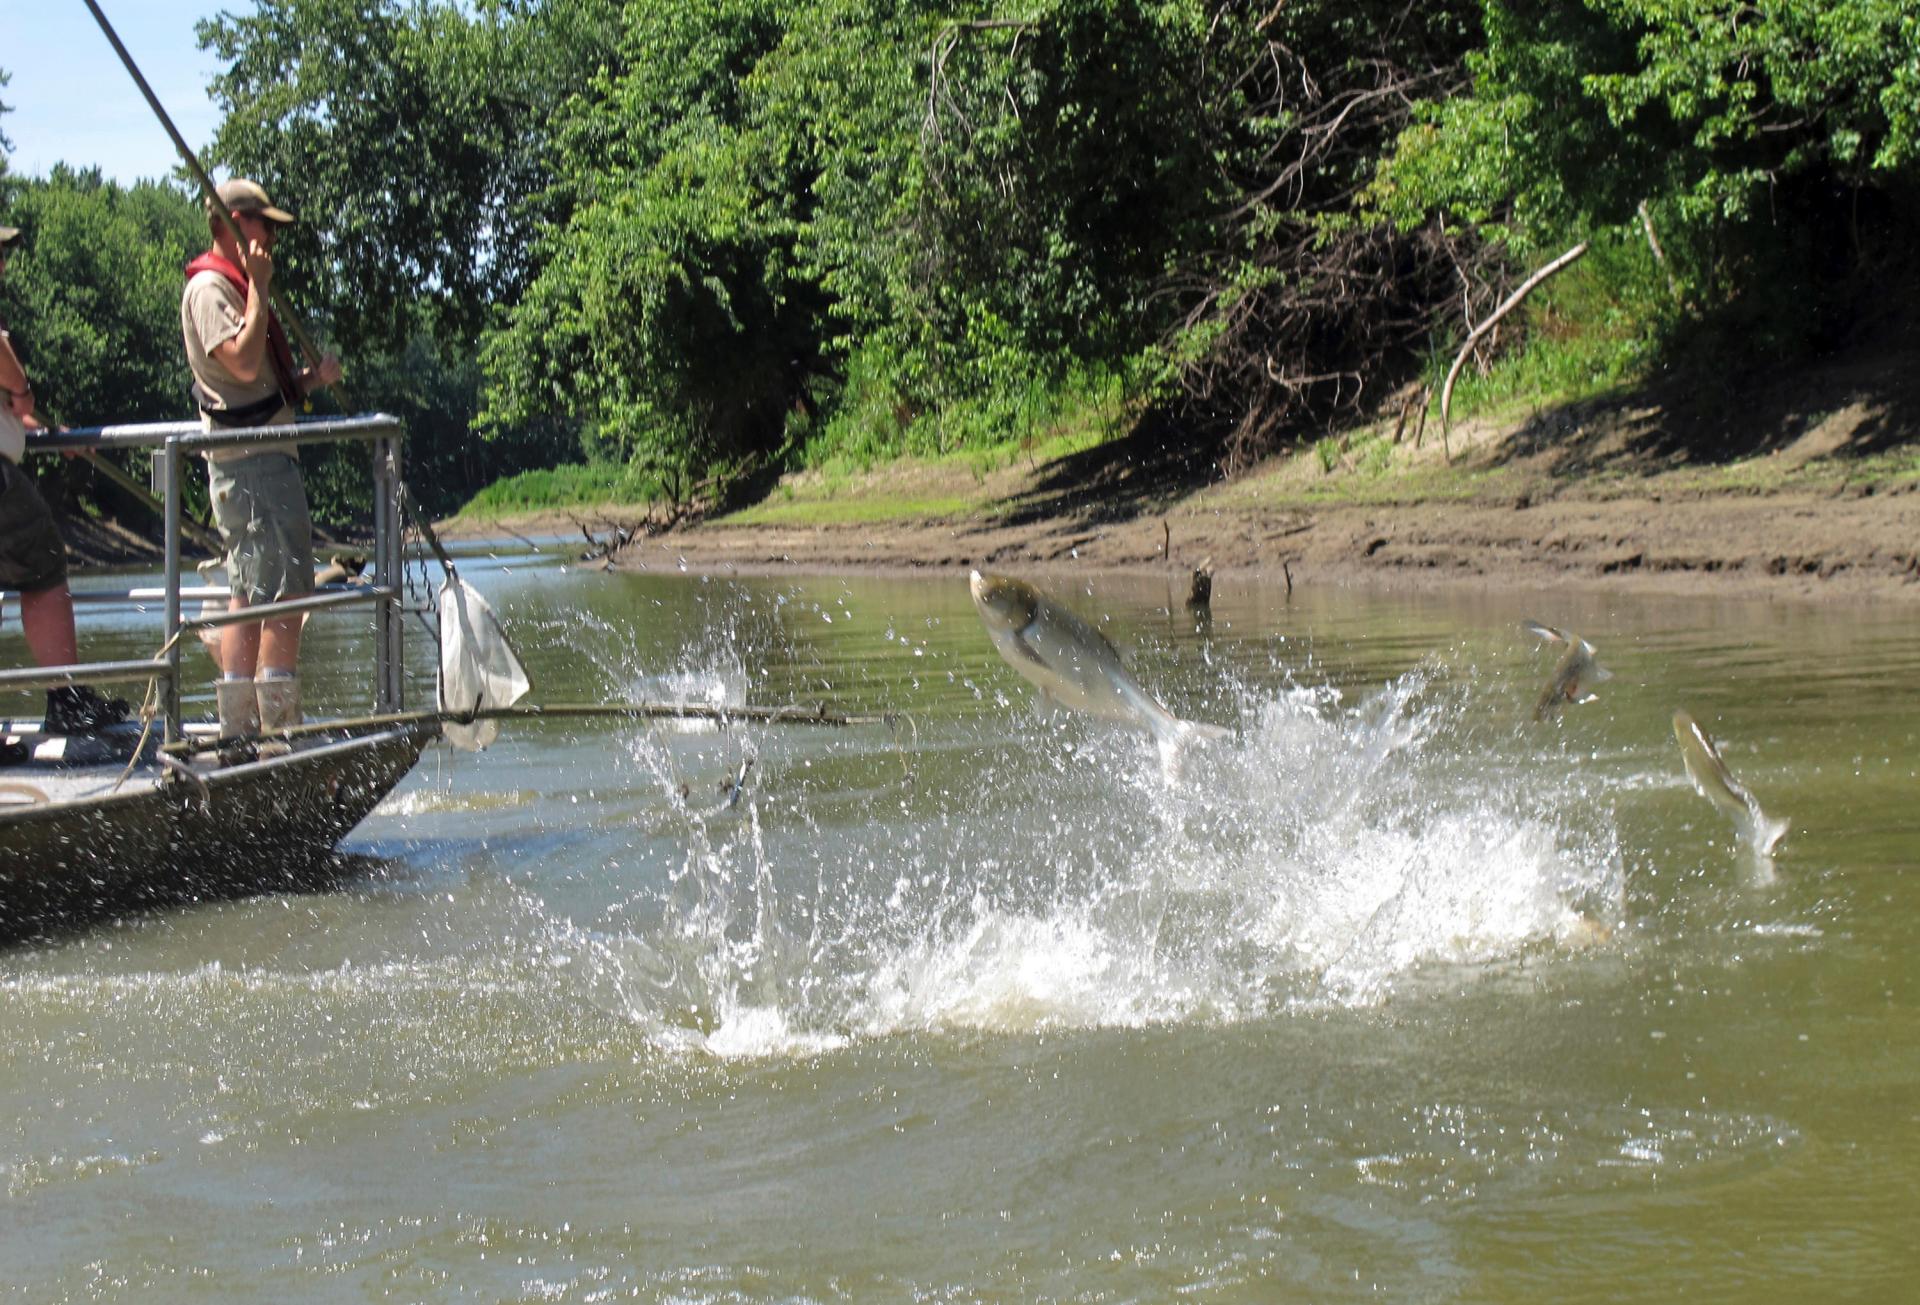 Illinois governor OKs first steps on blocking Asian carp